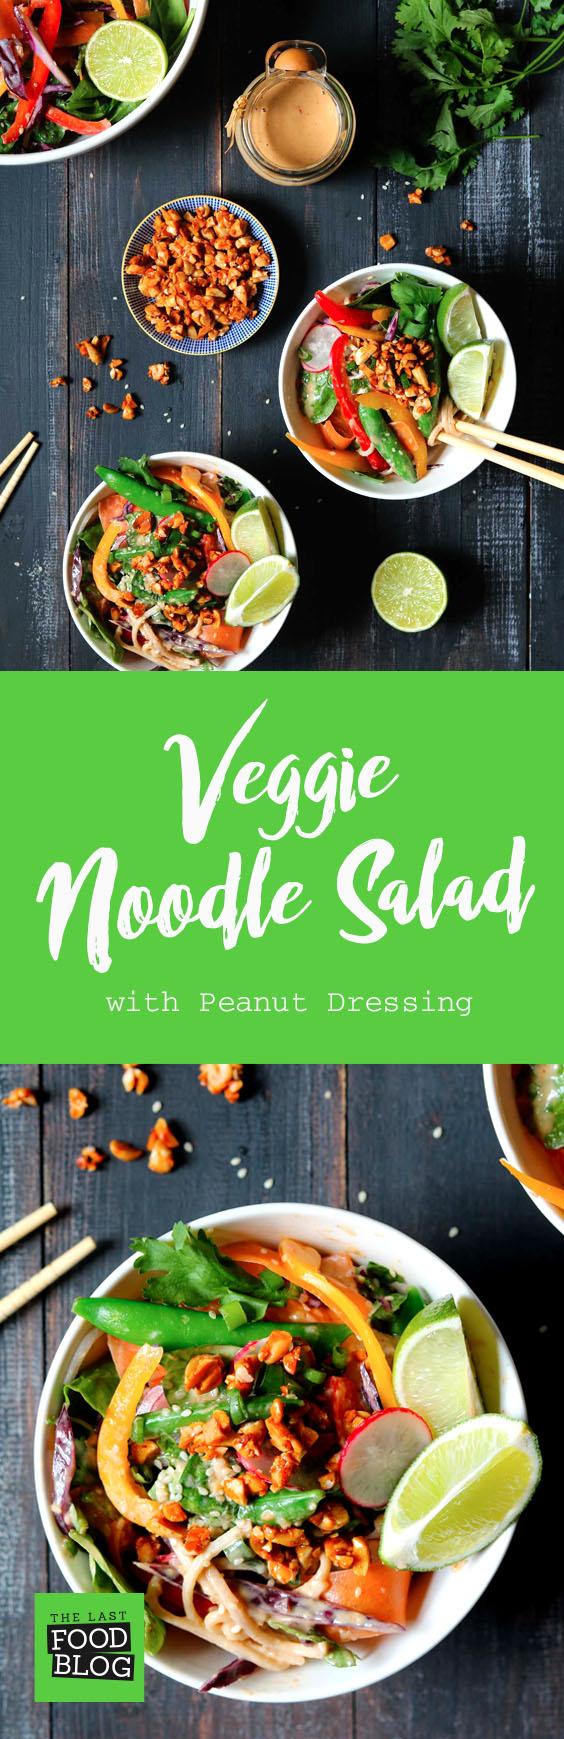 Veggie Noodle Salad - thelastfoodblog.com